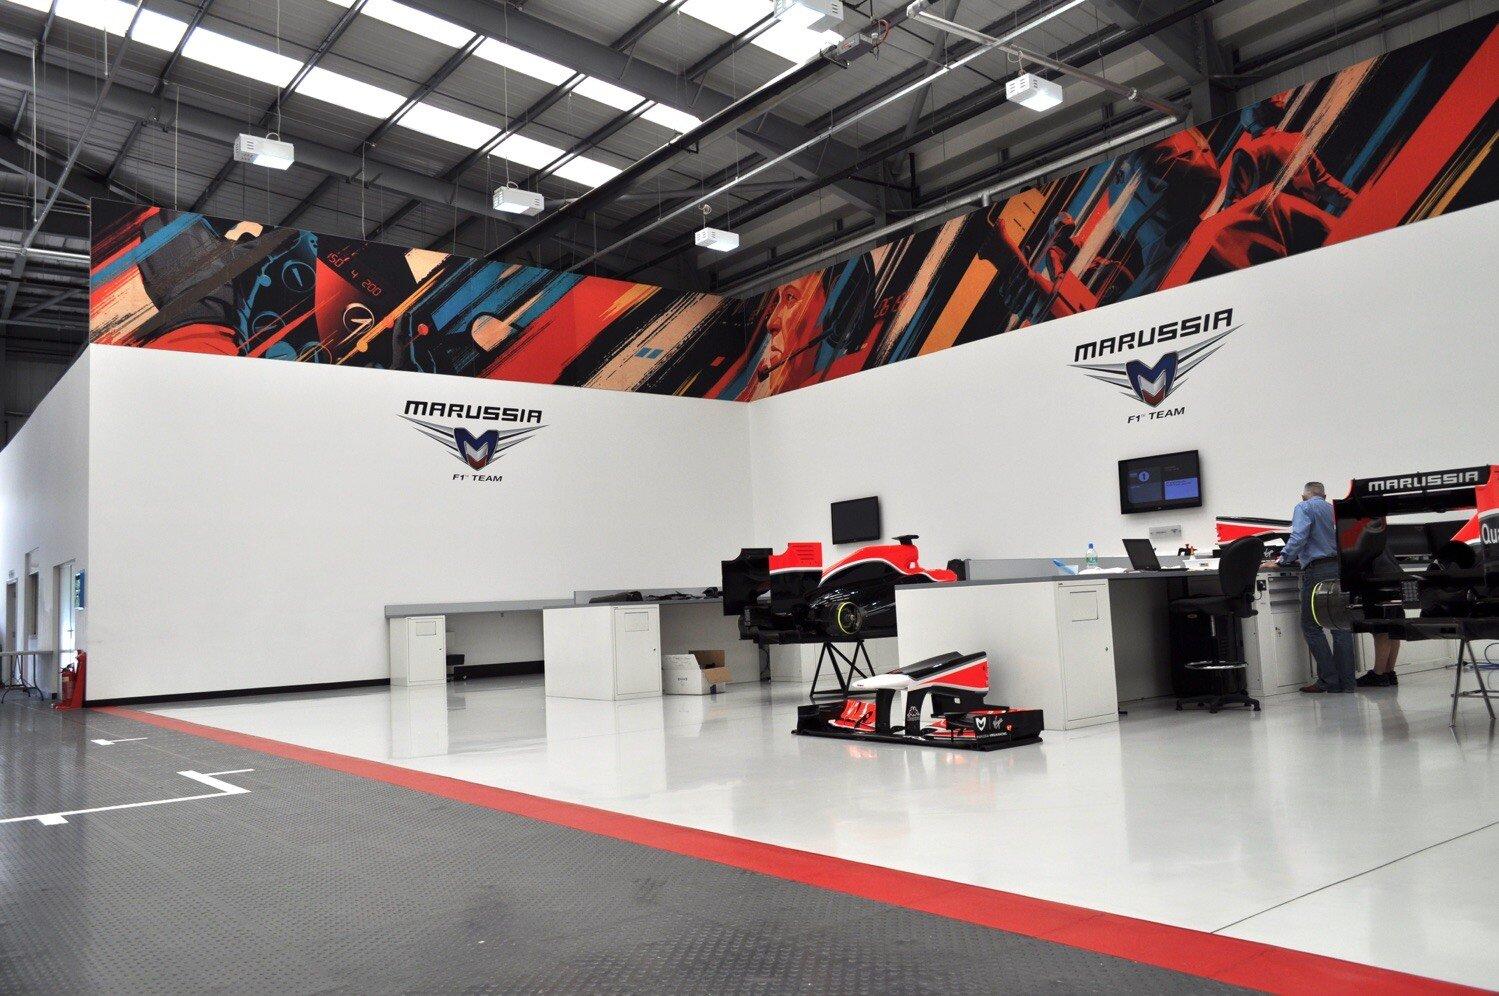 tavis-coburn-F1-team-graphic-illustration-marussia-29.jpg